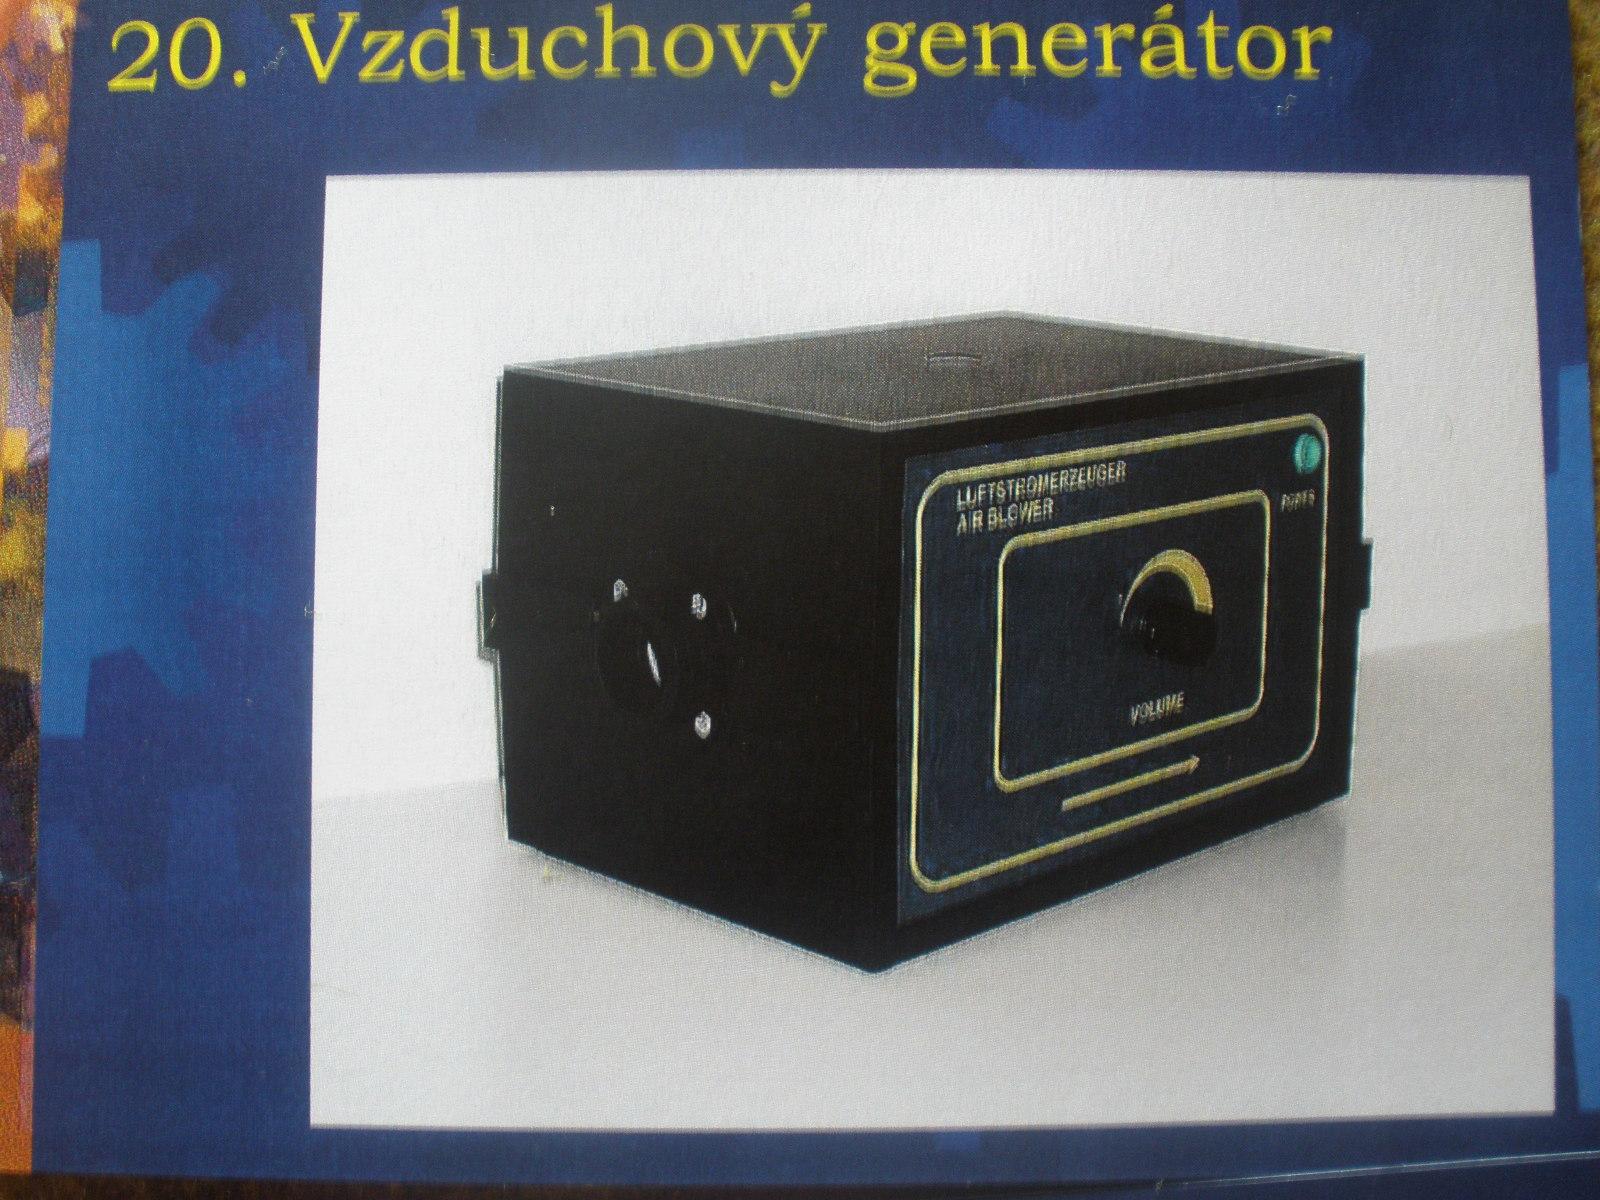 Vzduchový generátor